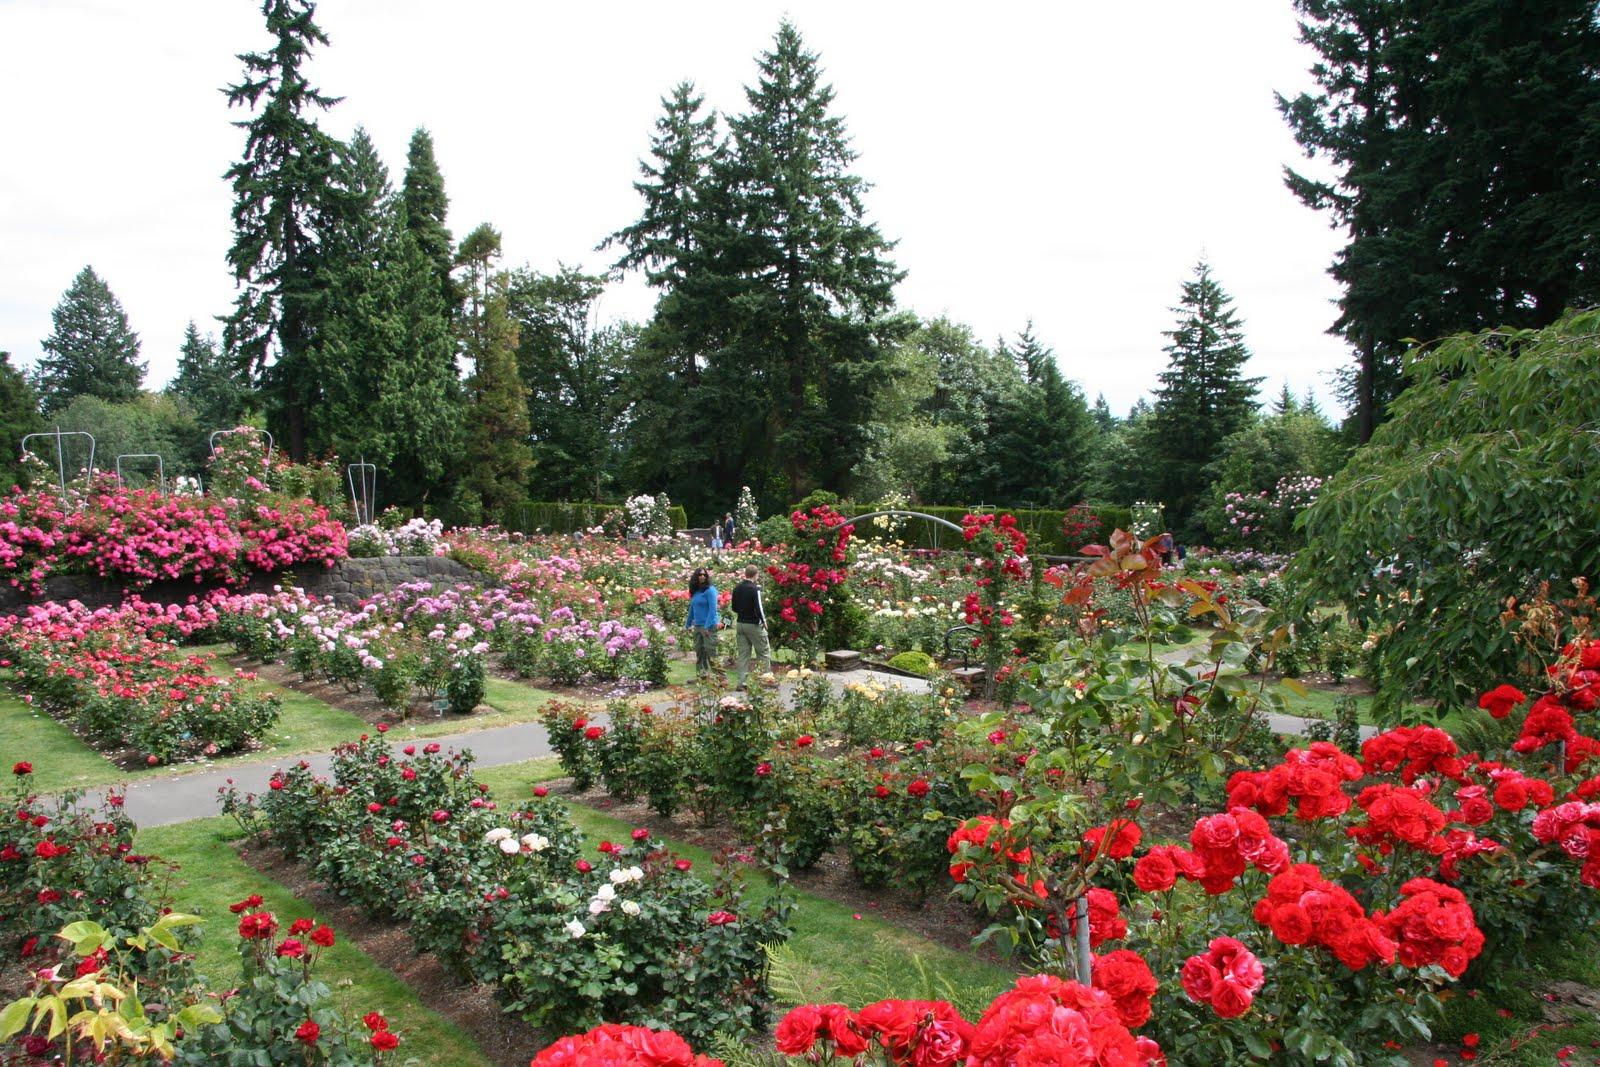 Daffodils Daydreams Garden Visit International Rose